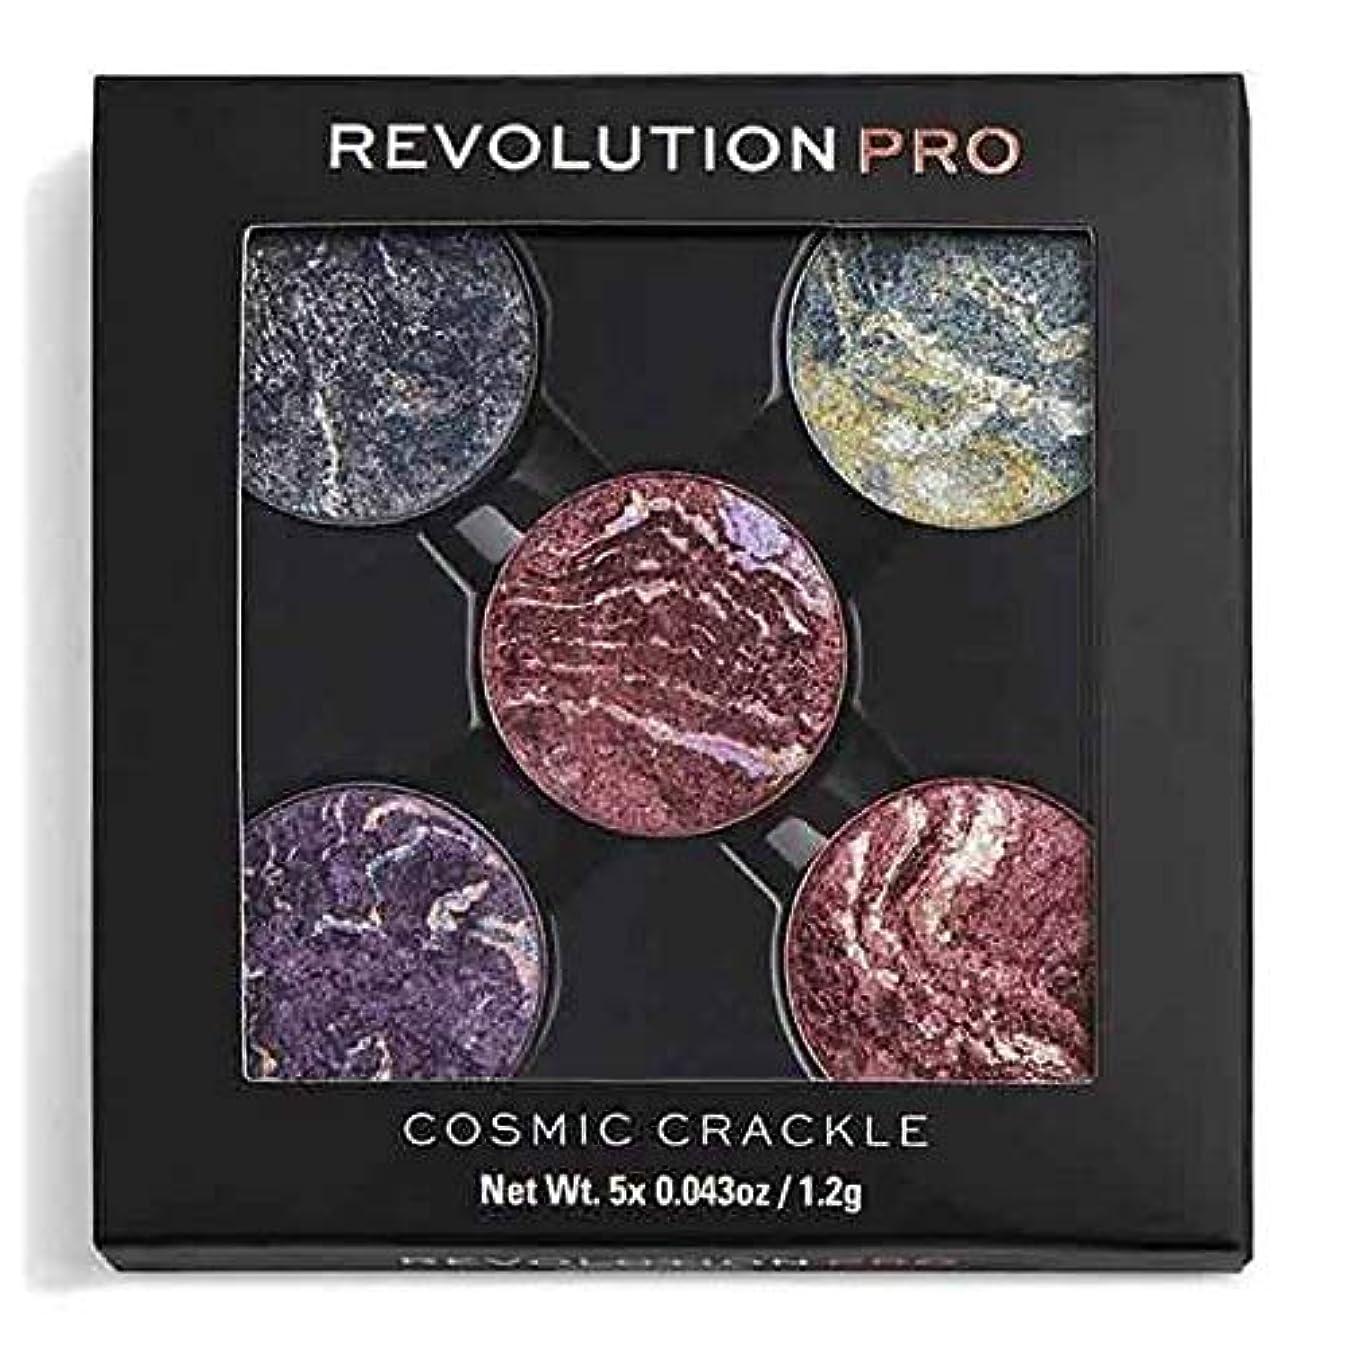 [Revolution ] 革命プロリフィルアイシャドウは、宇宙クラックルをパック - Revolution Pro Refill Eyeshadow Pack Cosmic Crackle [並行輸入品]